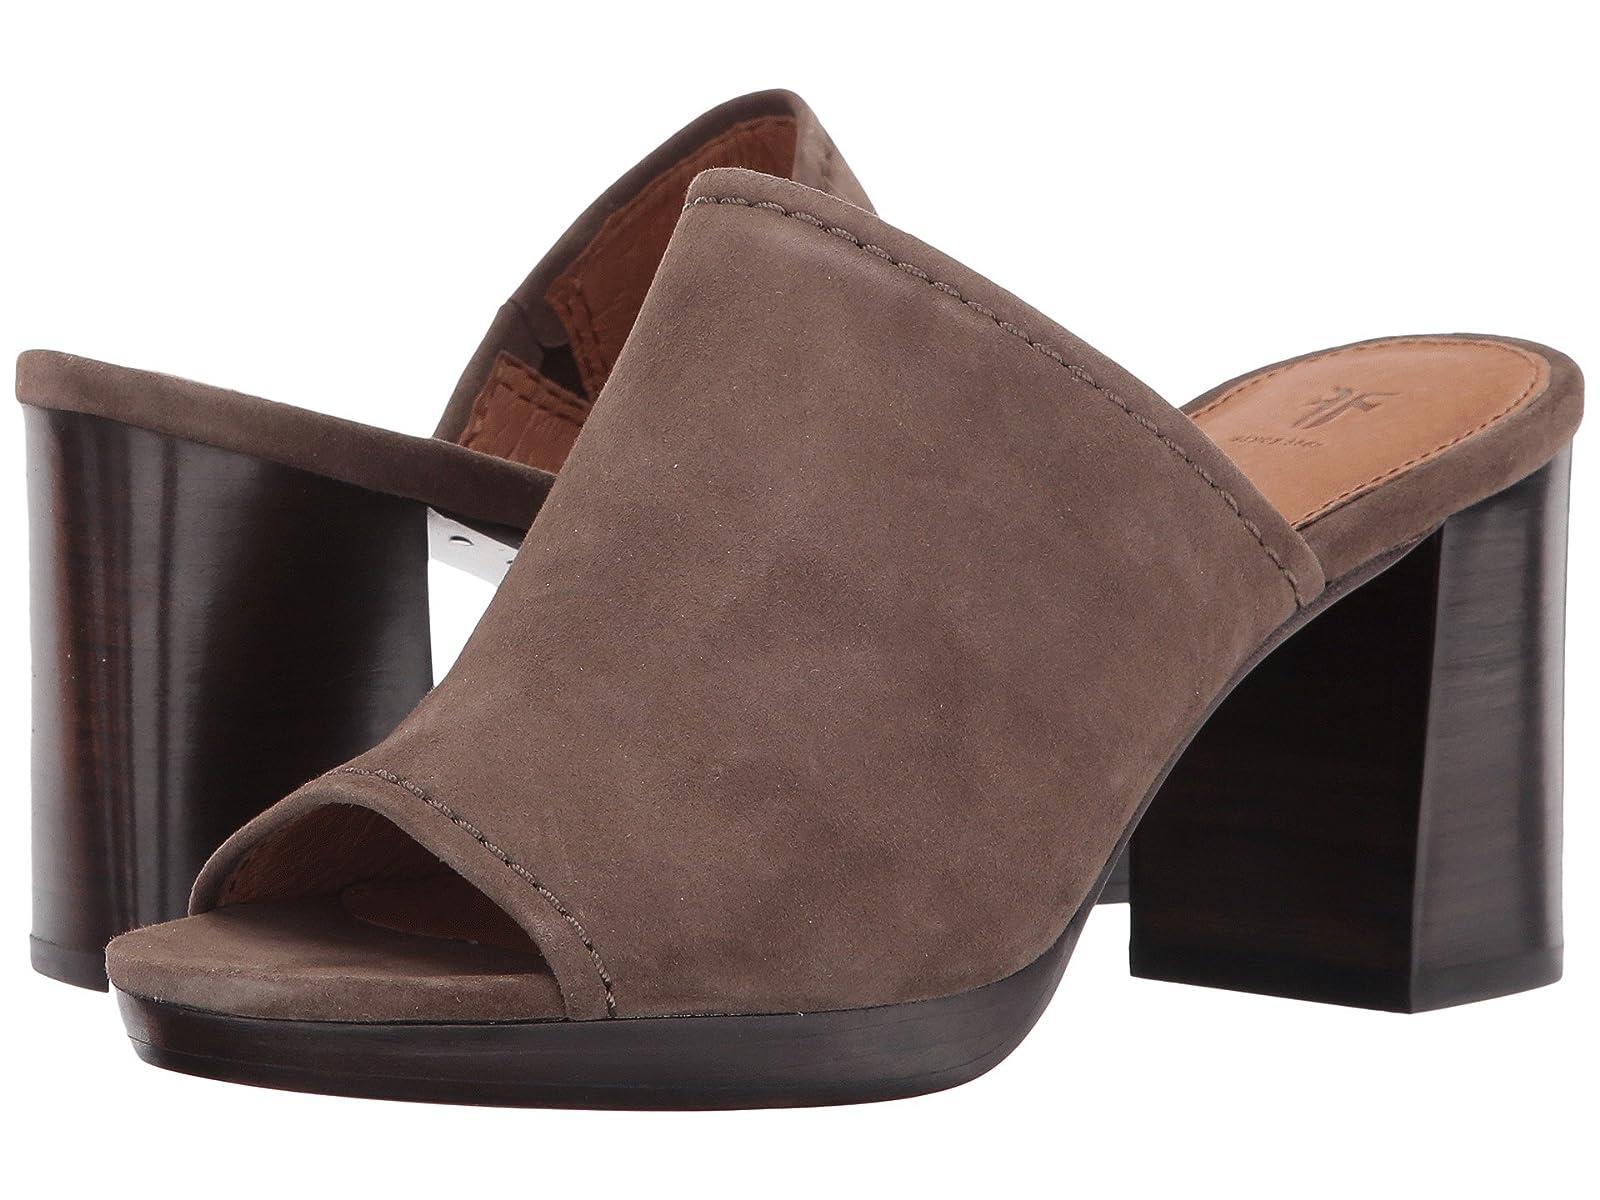 Frye Blake MuleCheap and distinctive eye-catching shoes